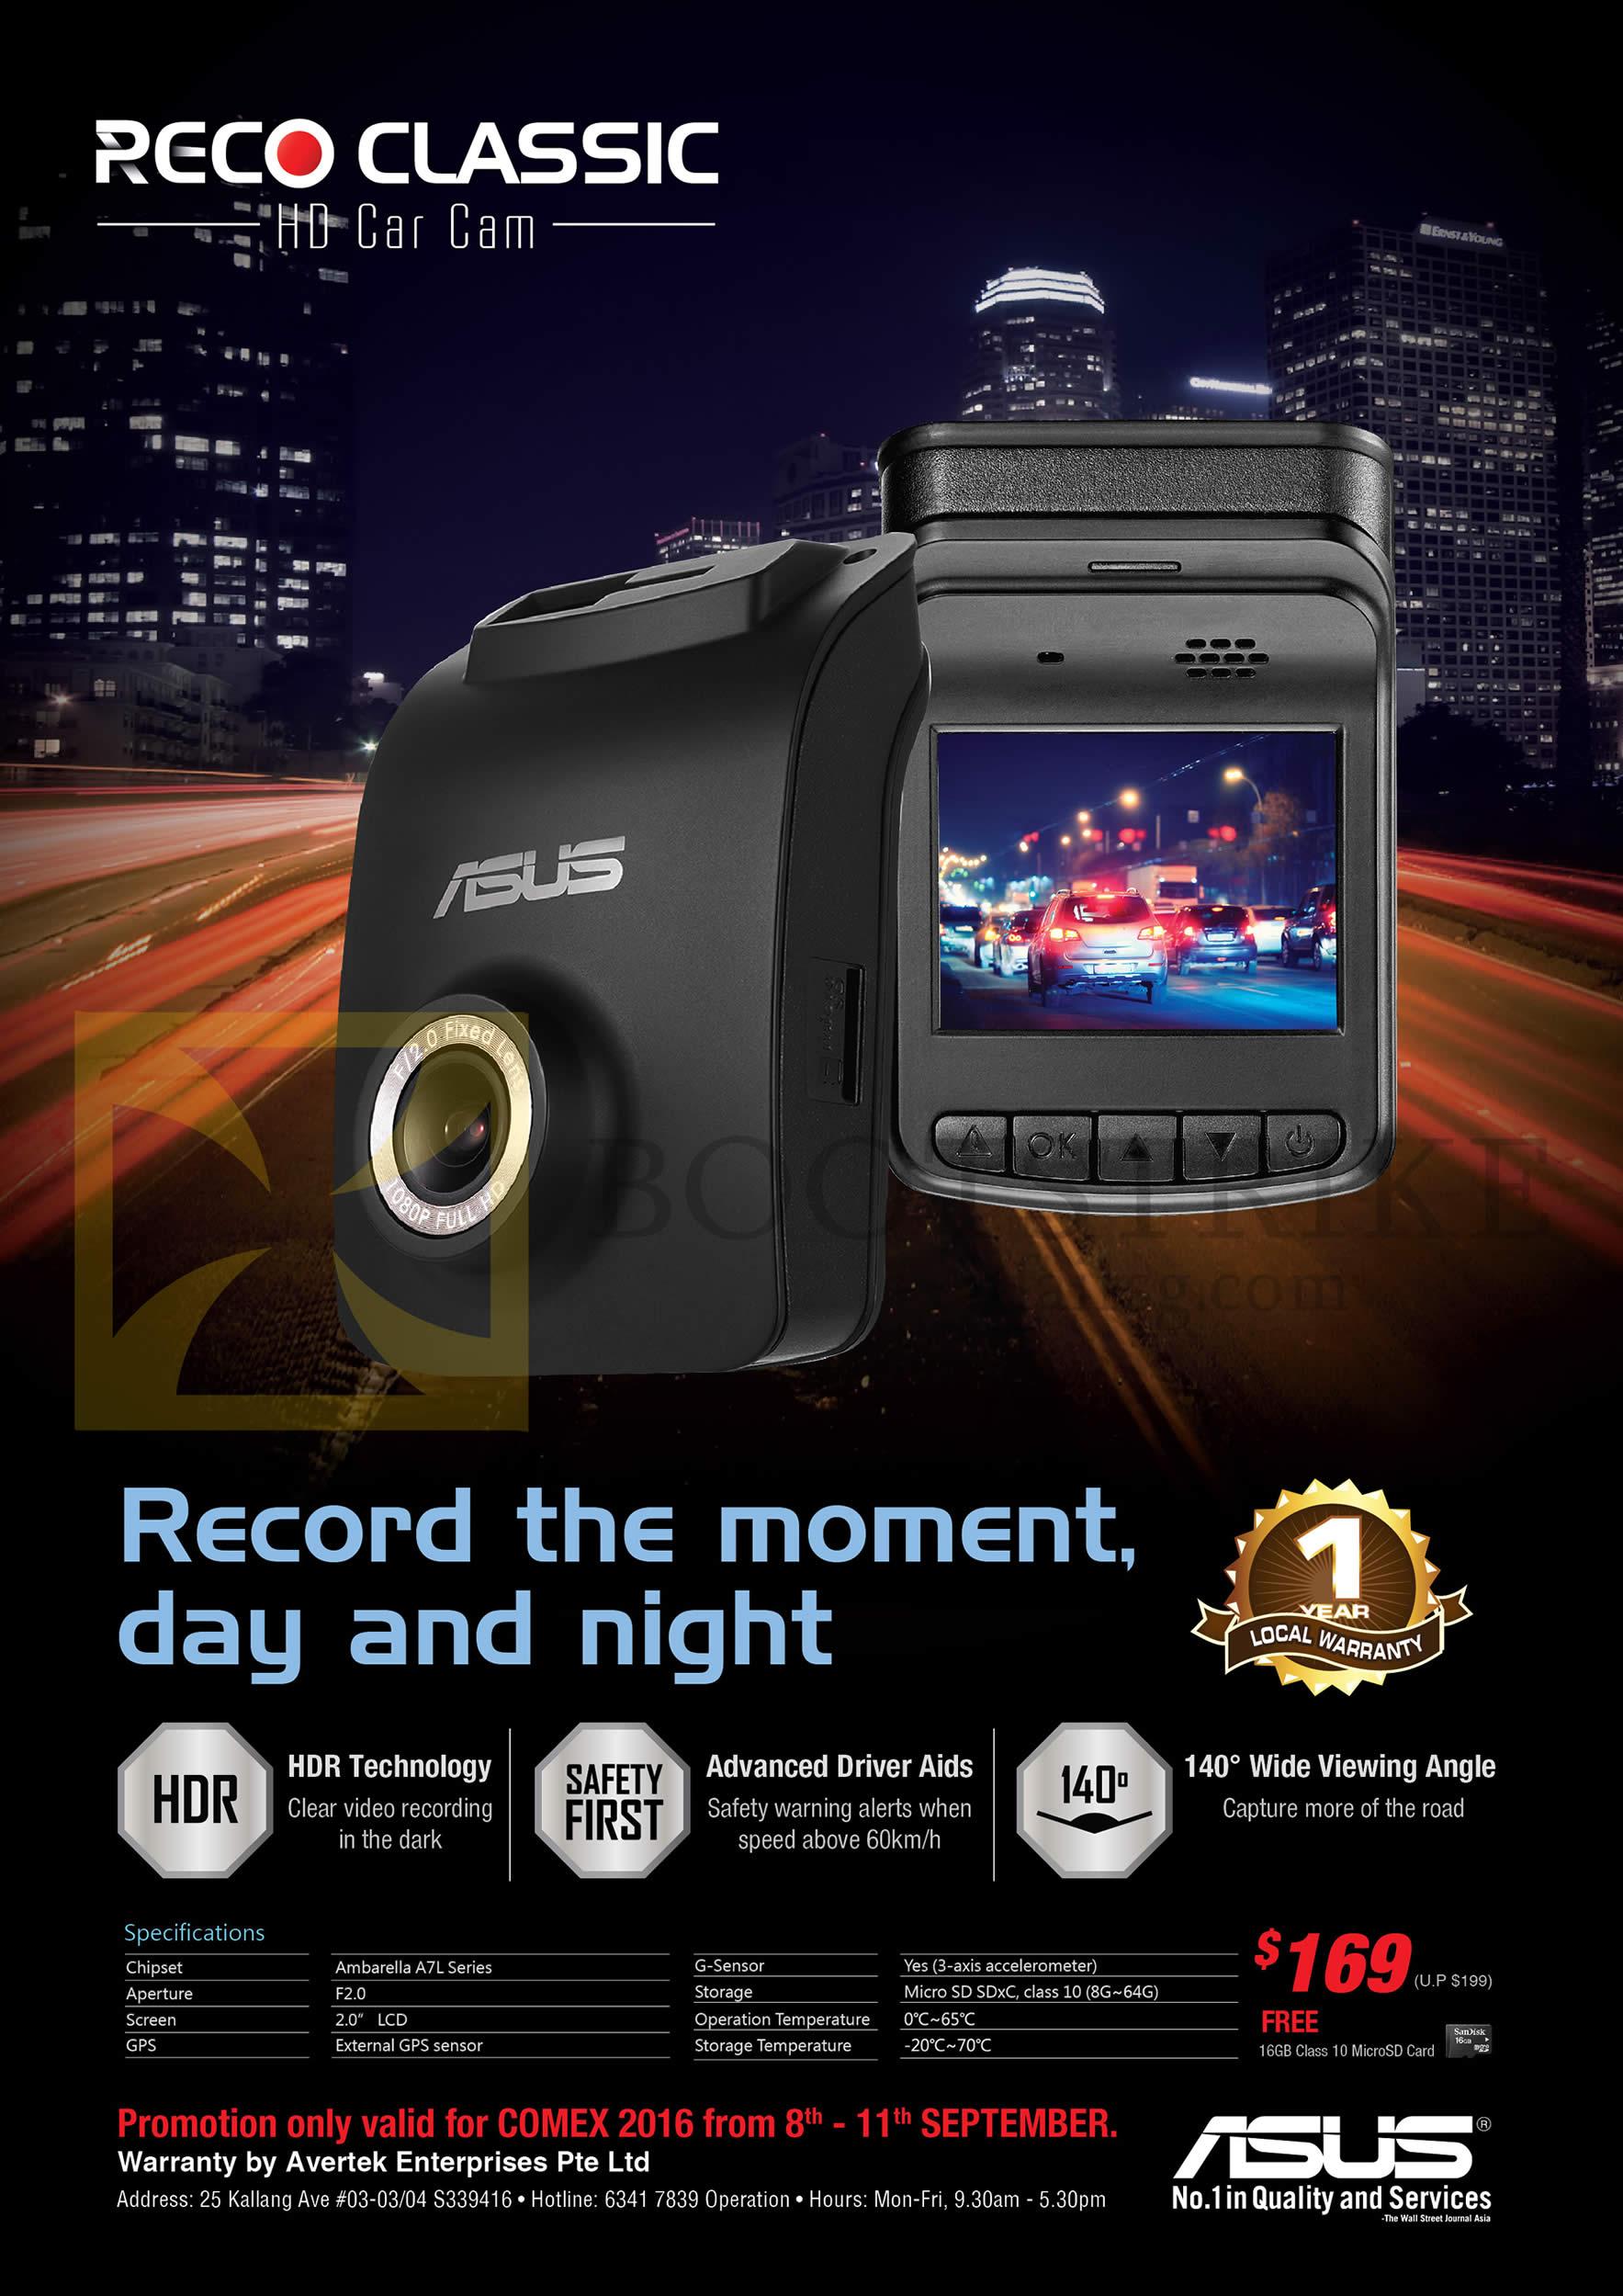 COMEX 2016 price list image brochure of ASUS Reco CAM Classic HD Car Cam